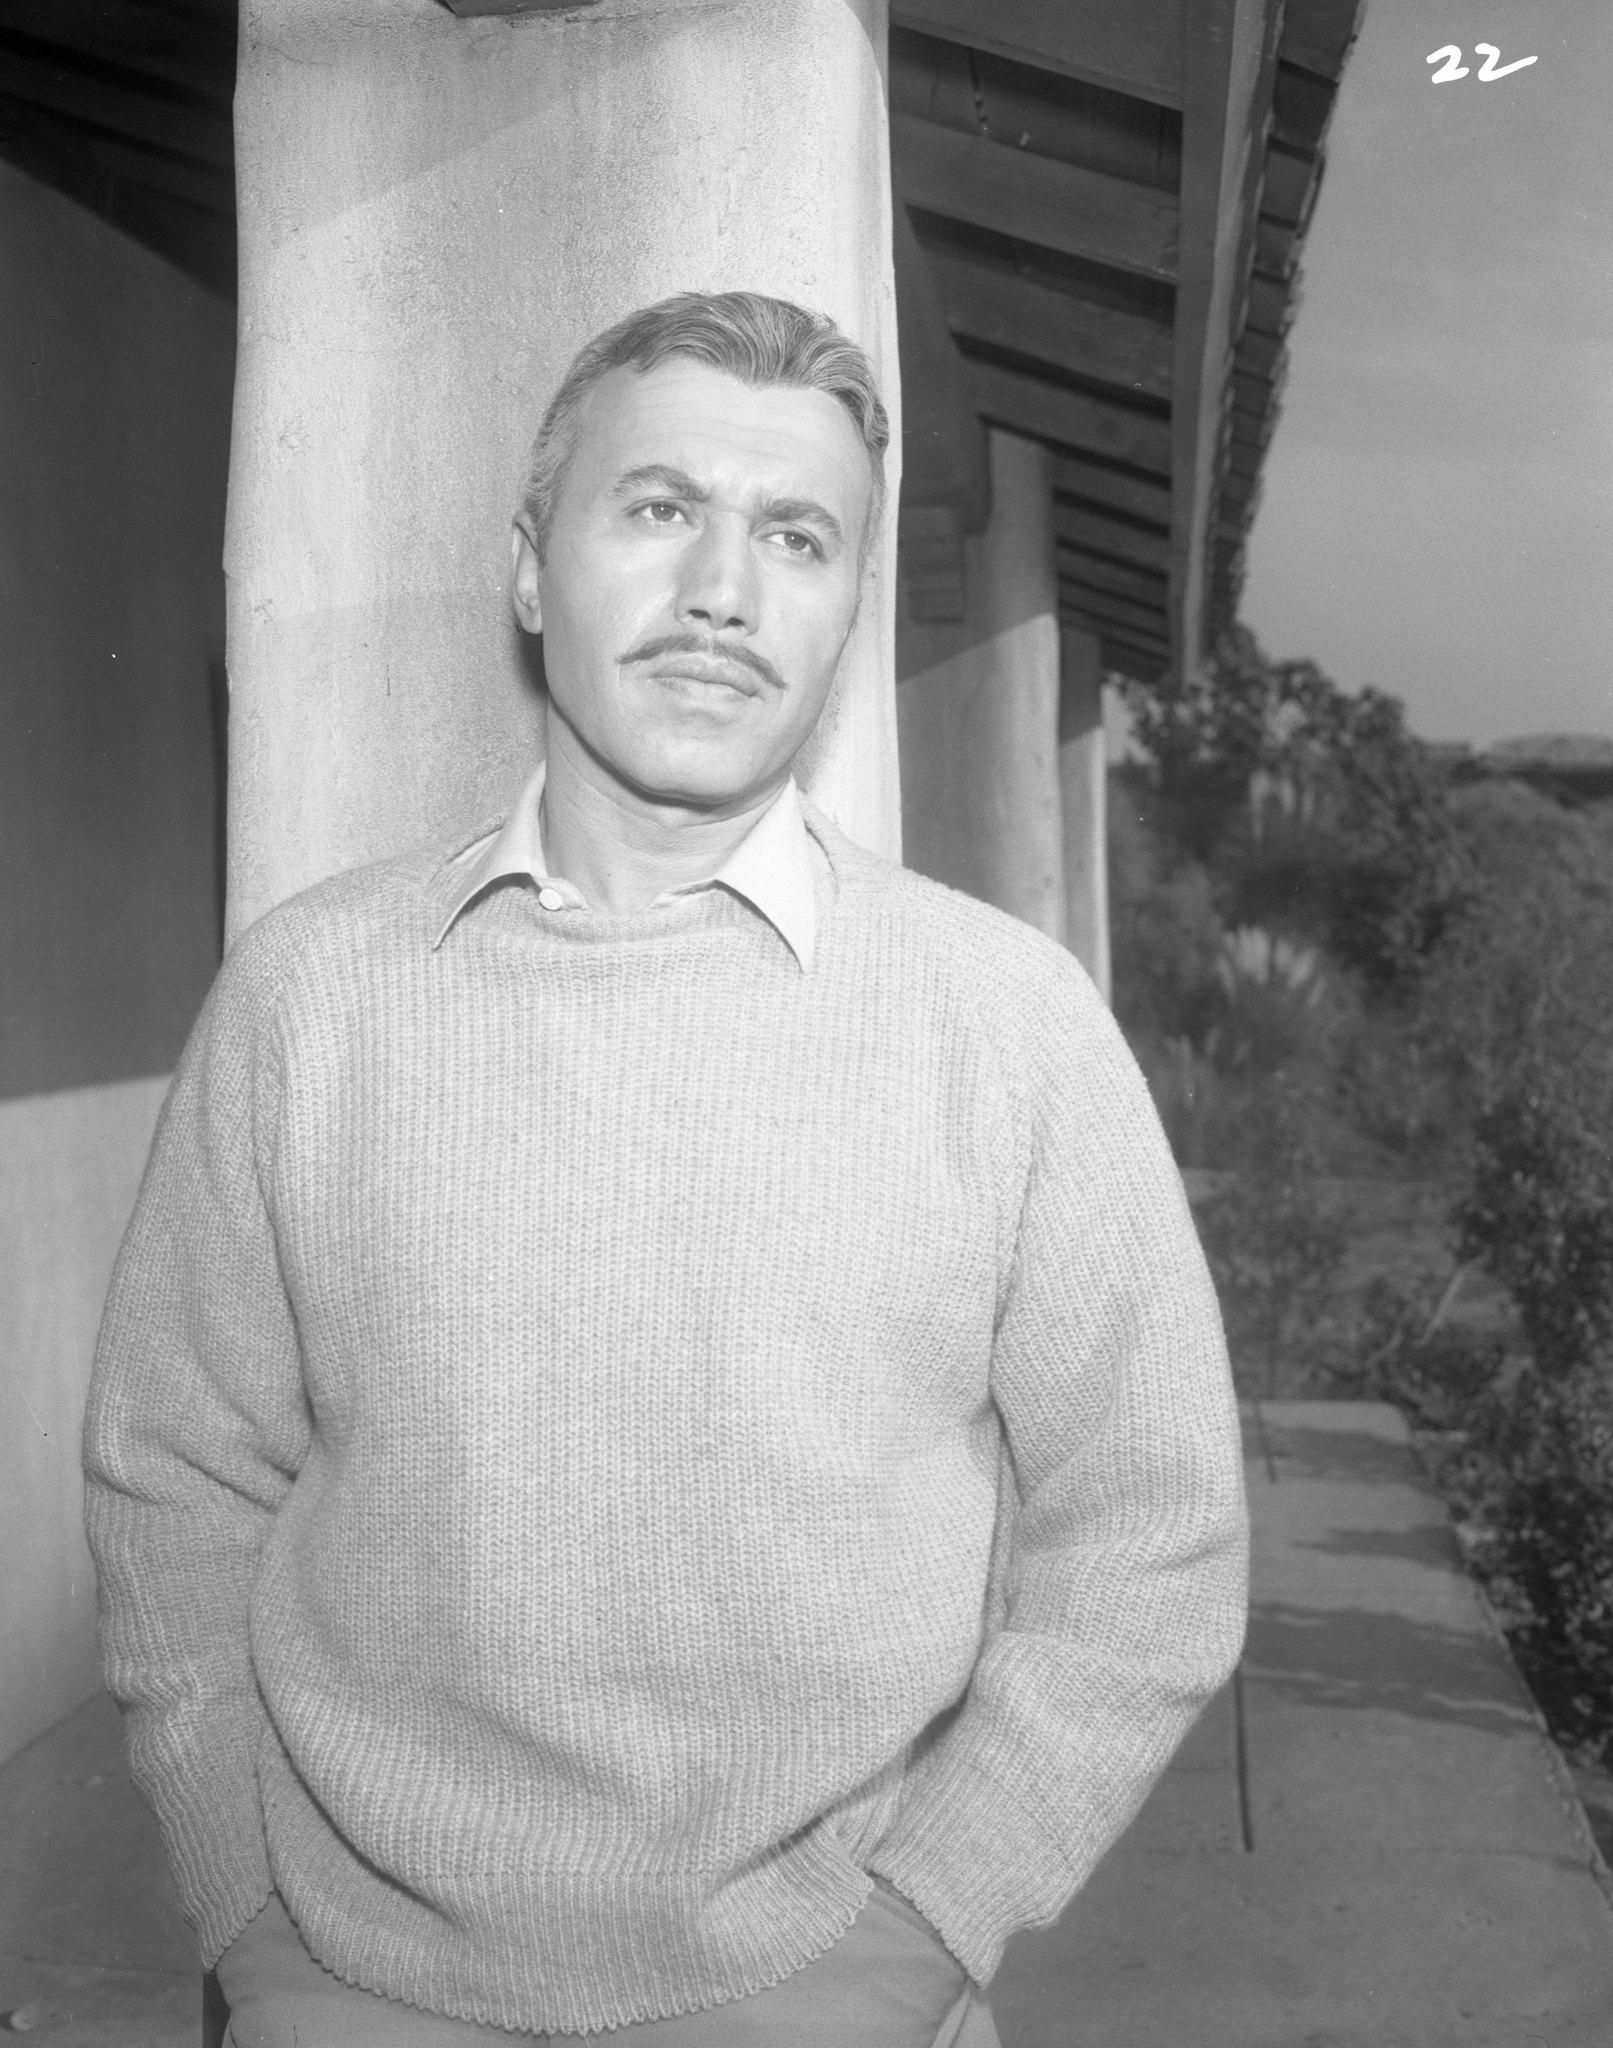 Michael Ansara in The Untouchables (1959)